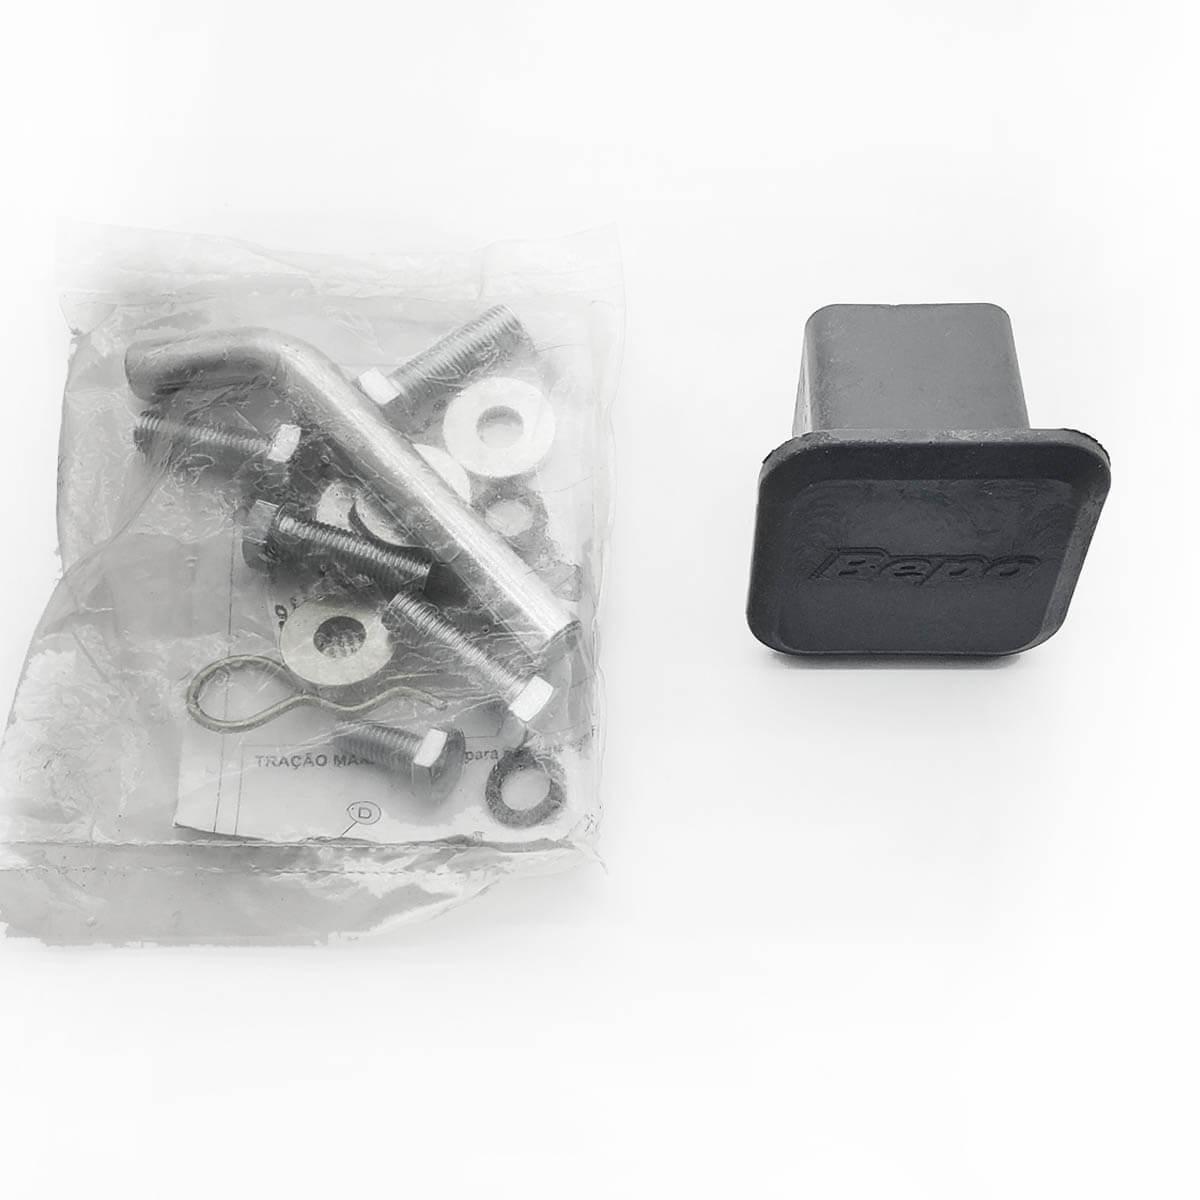 Engate de reboque Amarok 2011 a 2020 Bepo removível 700 Kg